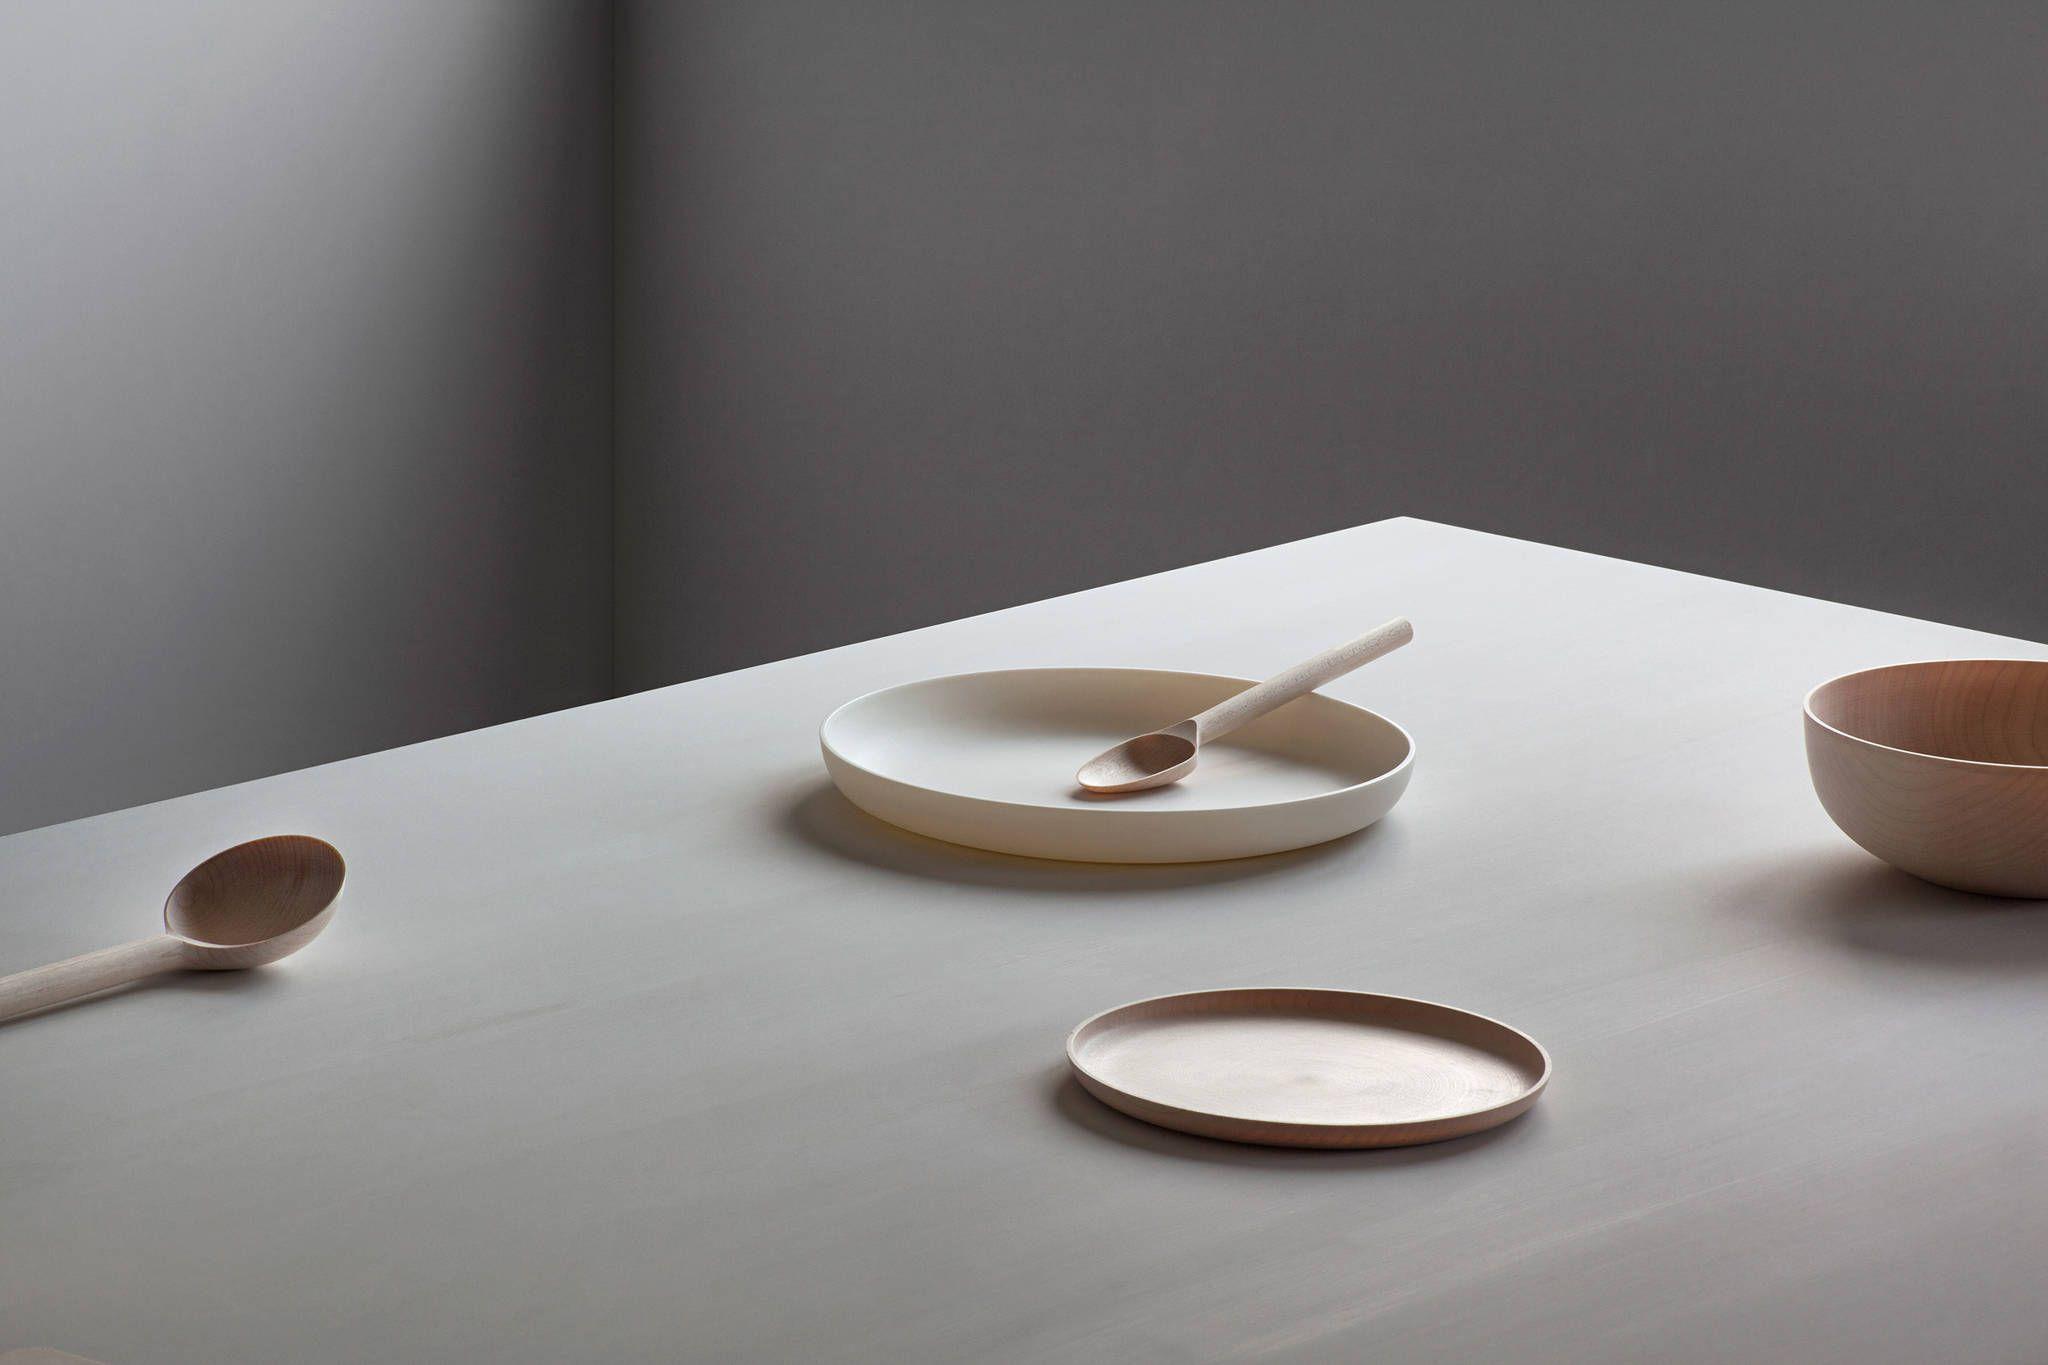 Mobile - Carlo Clopath Industrial Design